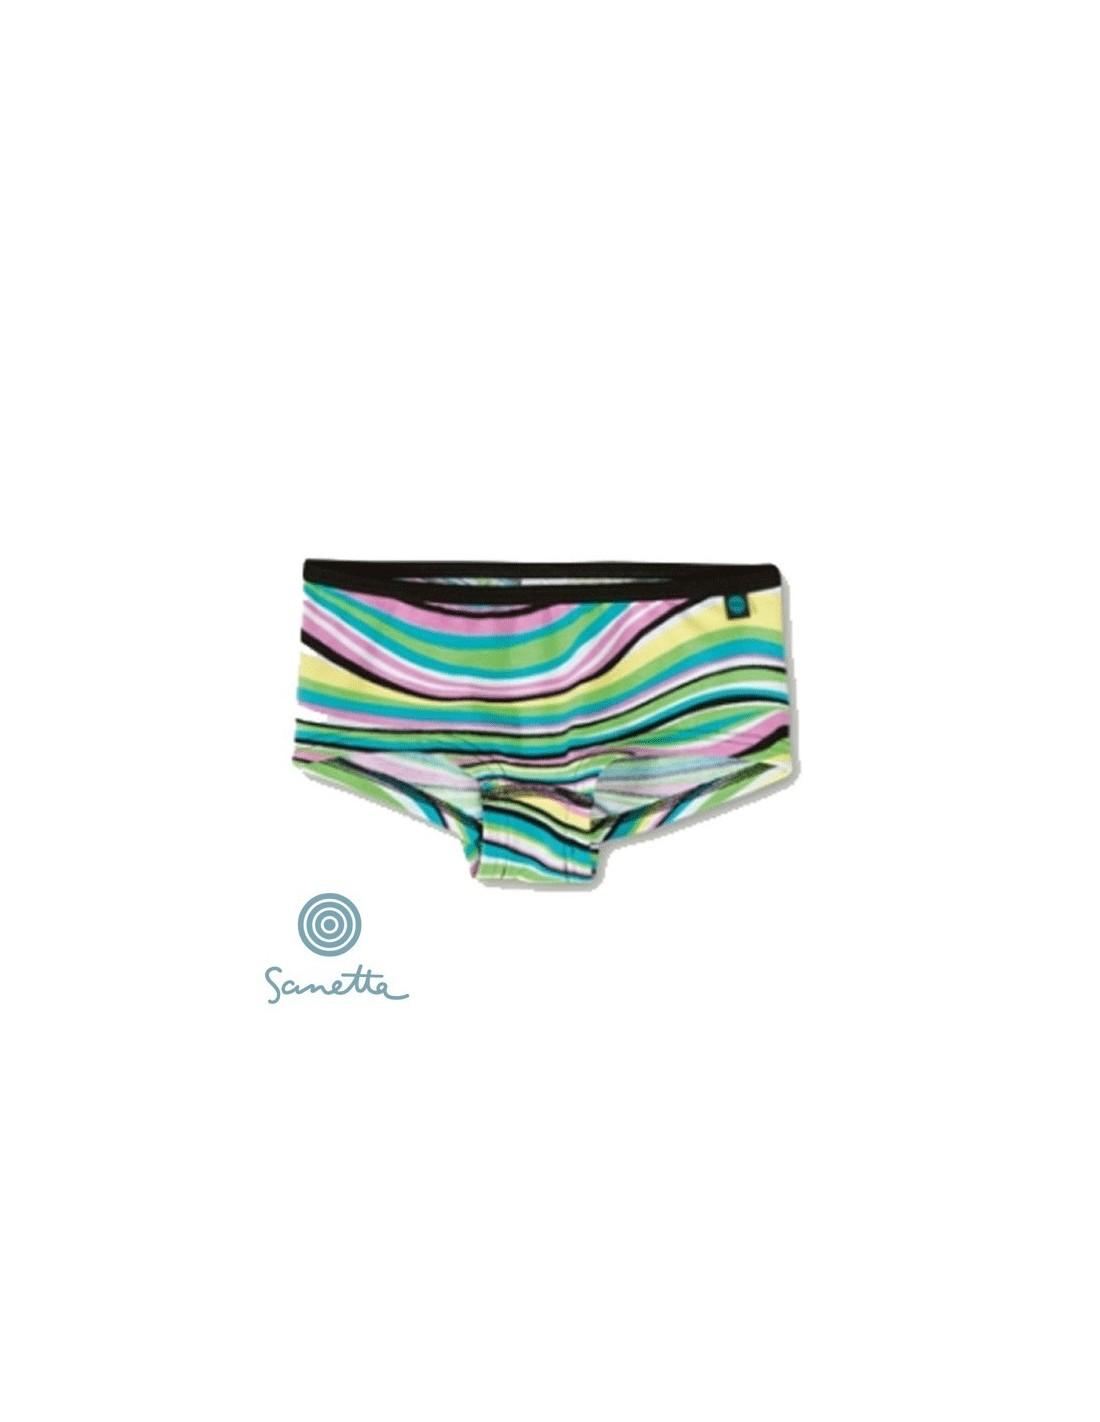 ee202749424e Lollipop Cotton Underwear